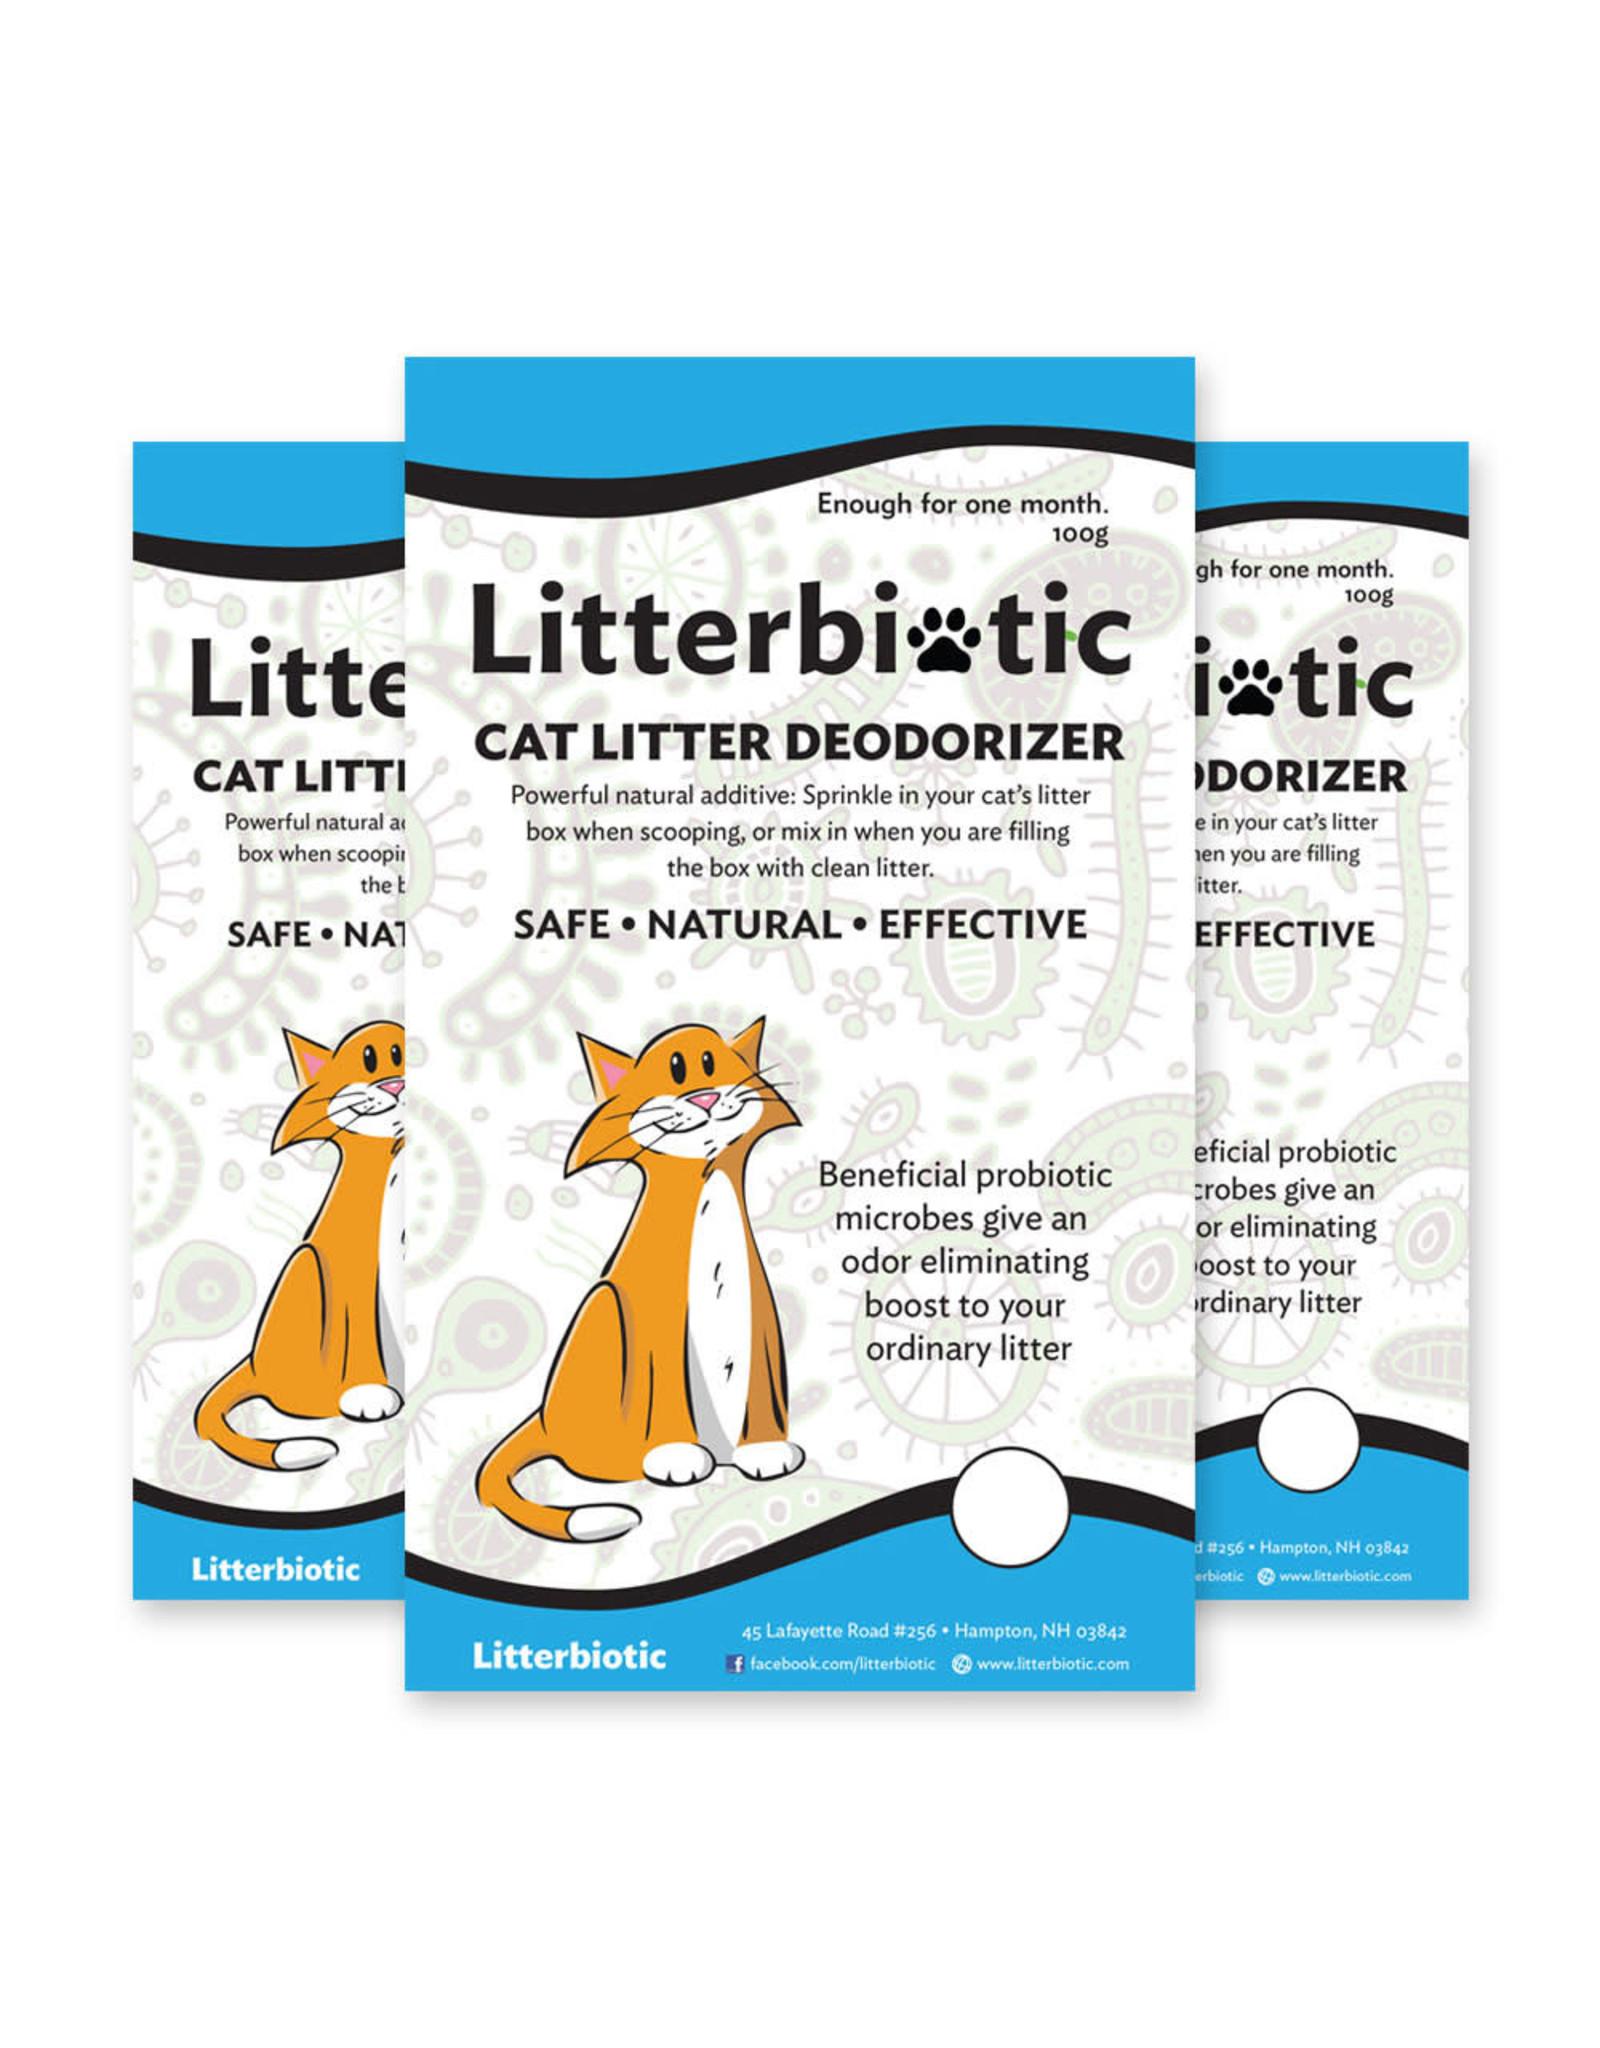 Litter Biotic Litterbiotic Deodorizer